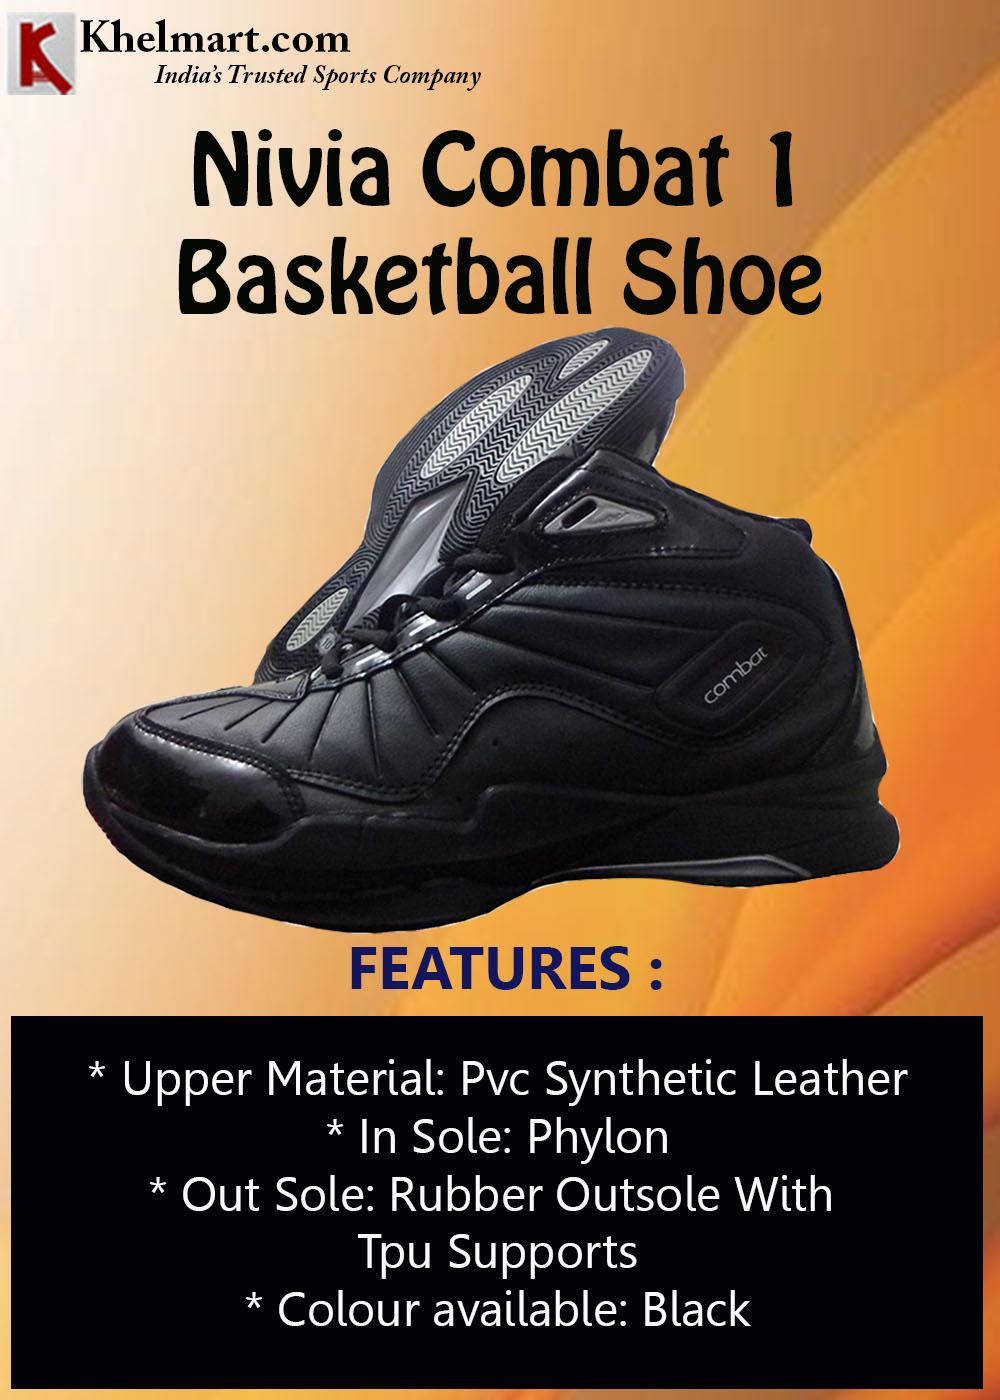 Nivia Combat 1 Basket Ball Shoe